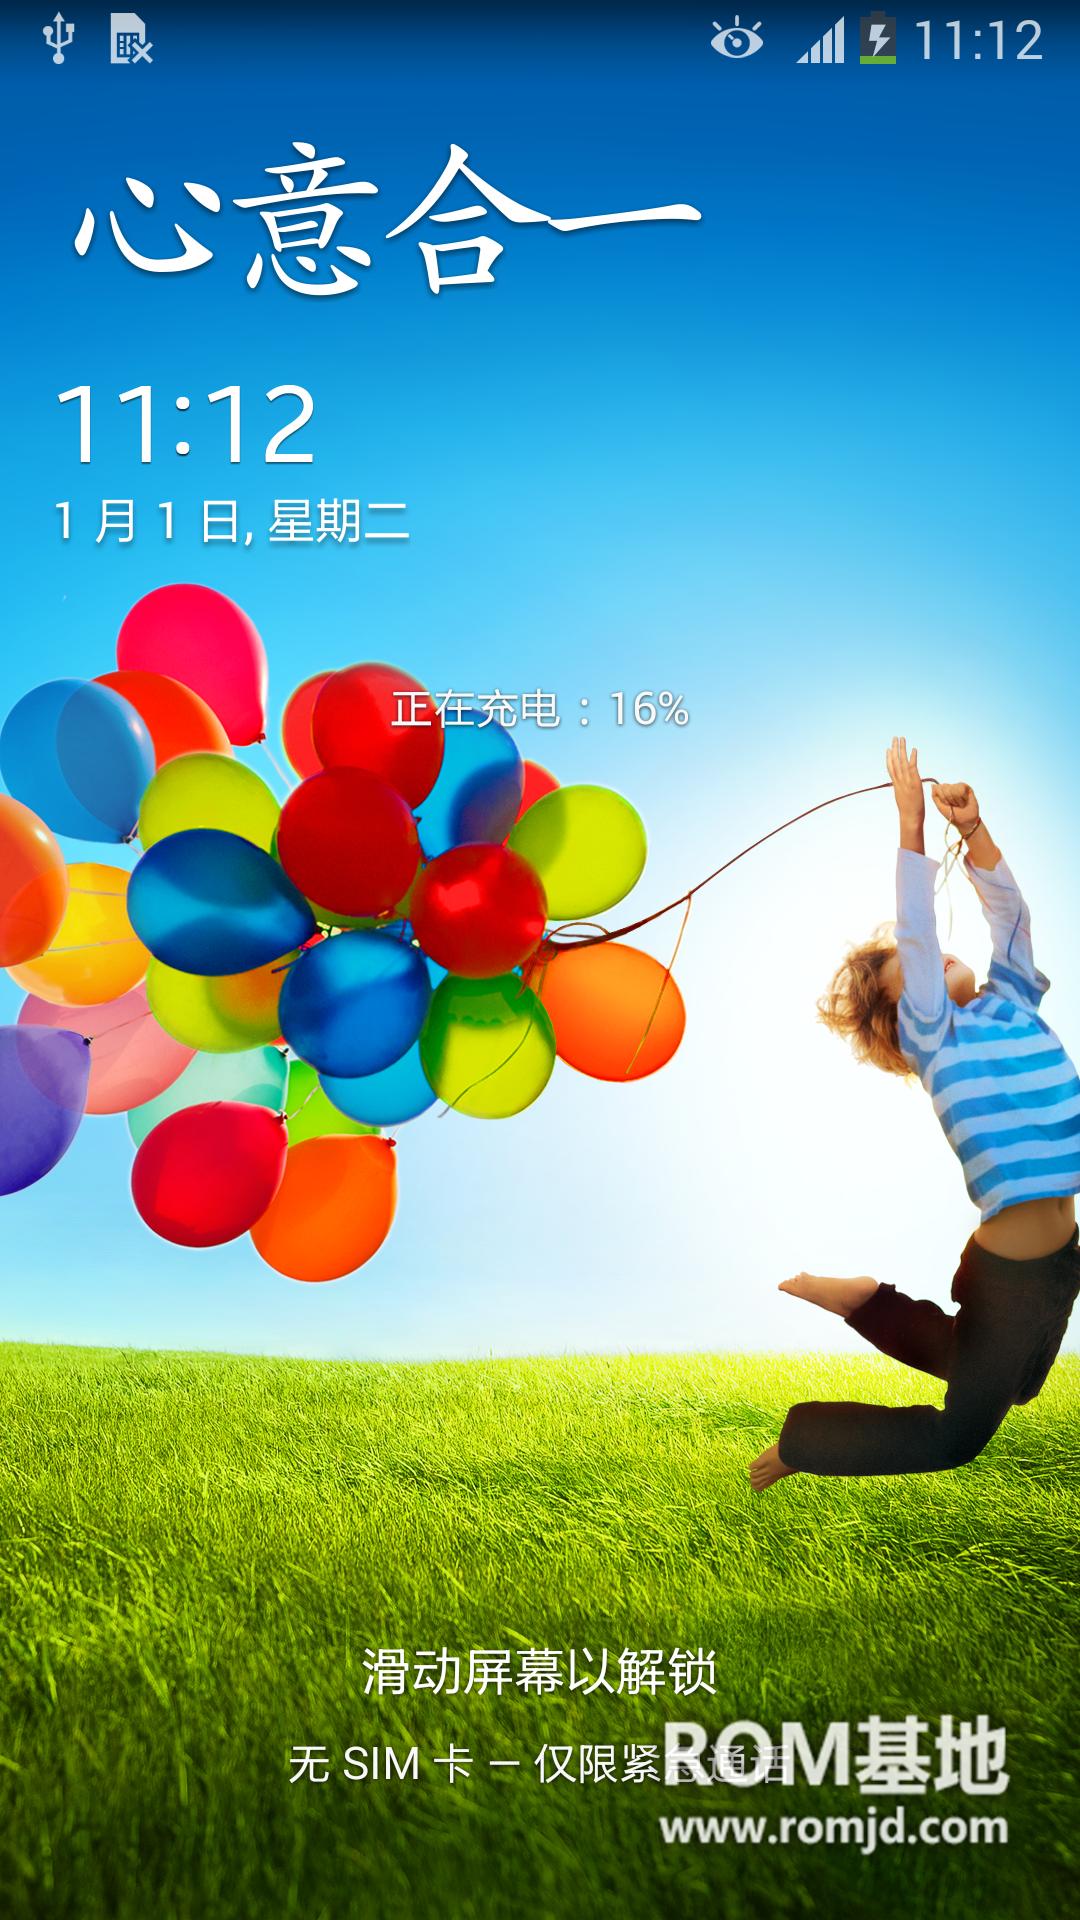 三星 N900(Note3)线刷包 Android4.4 官方ZSUDNB4固件五件套ROM刷机包下载